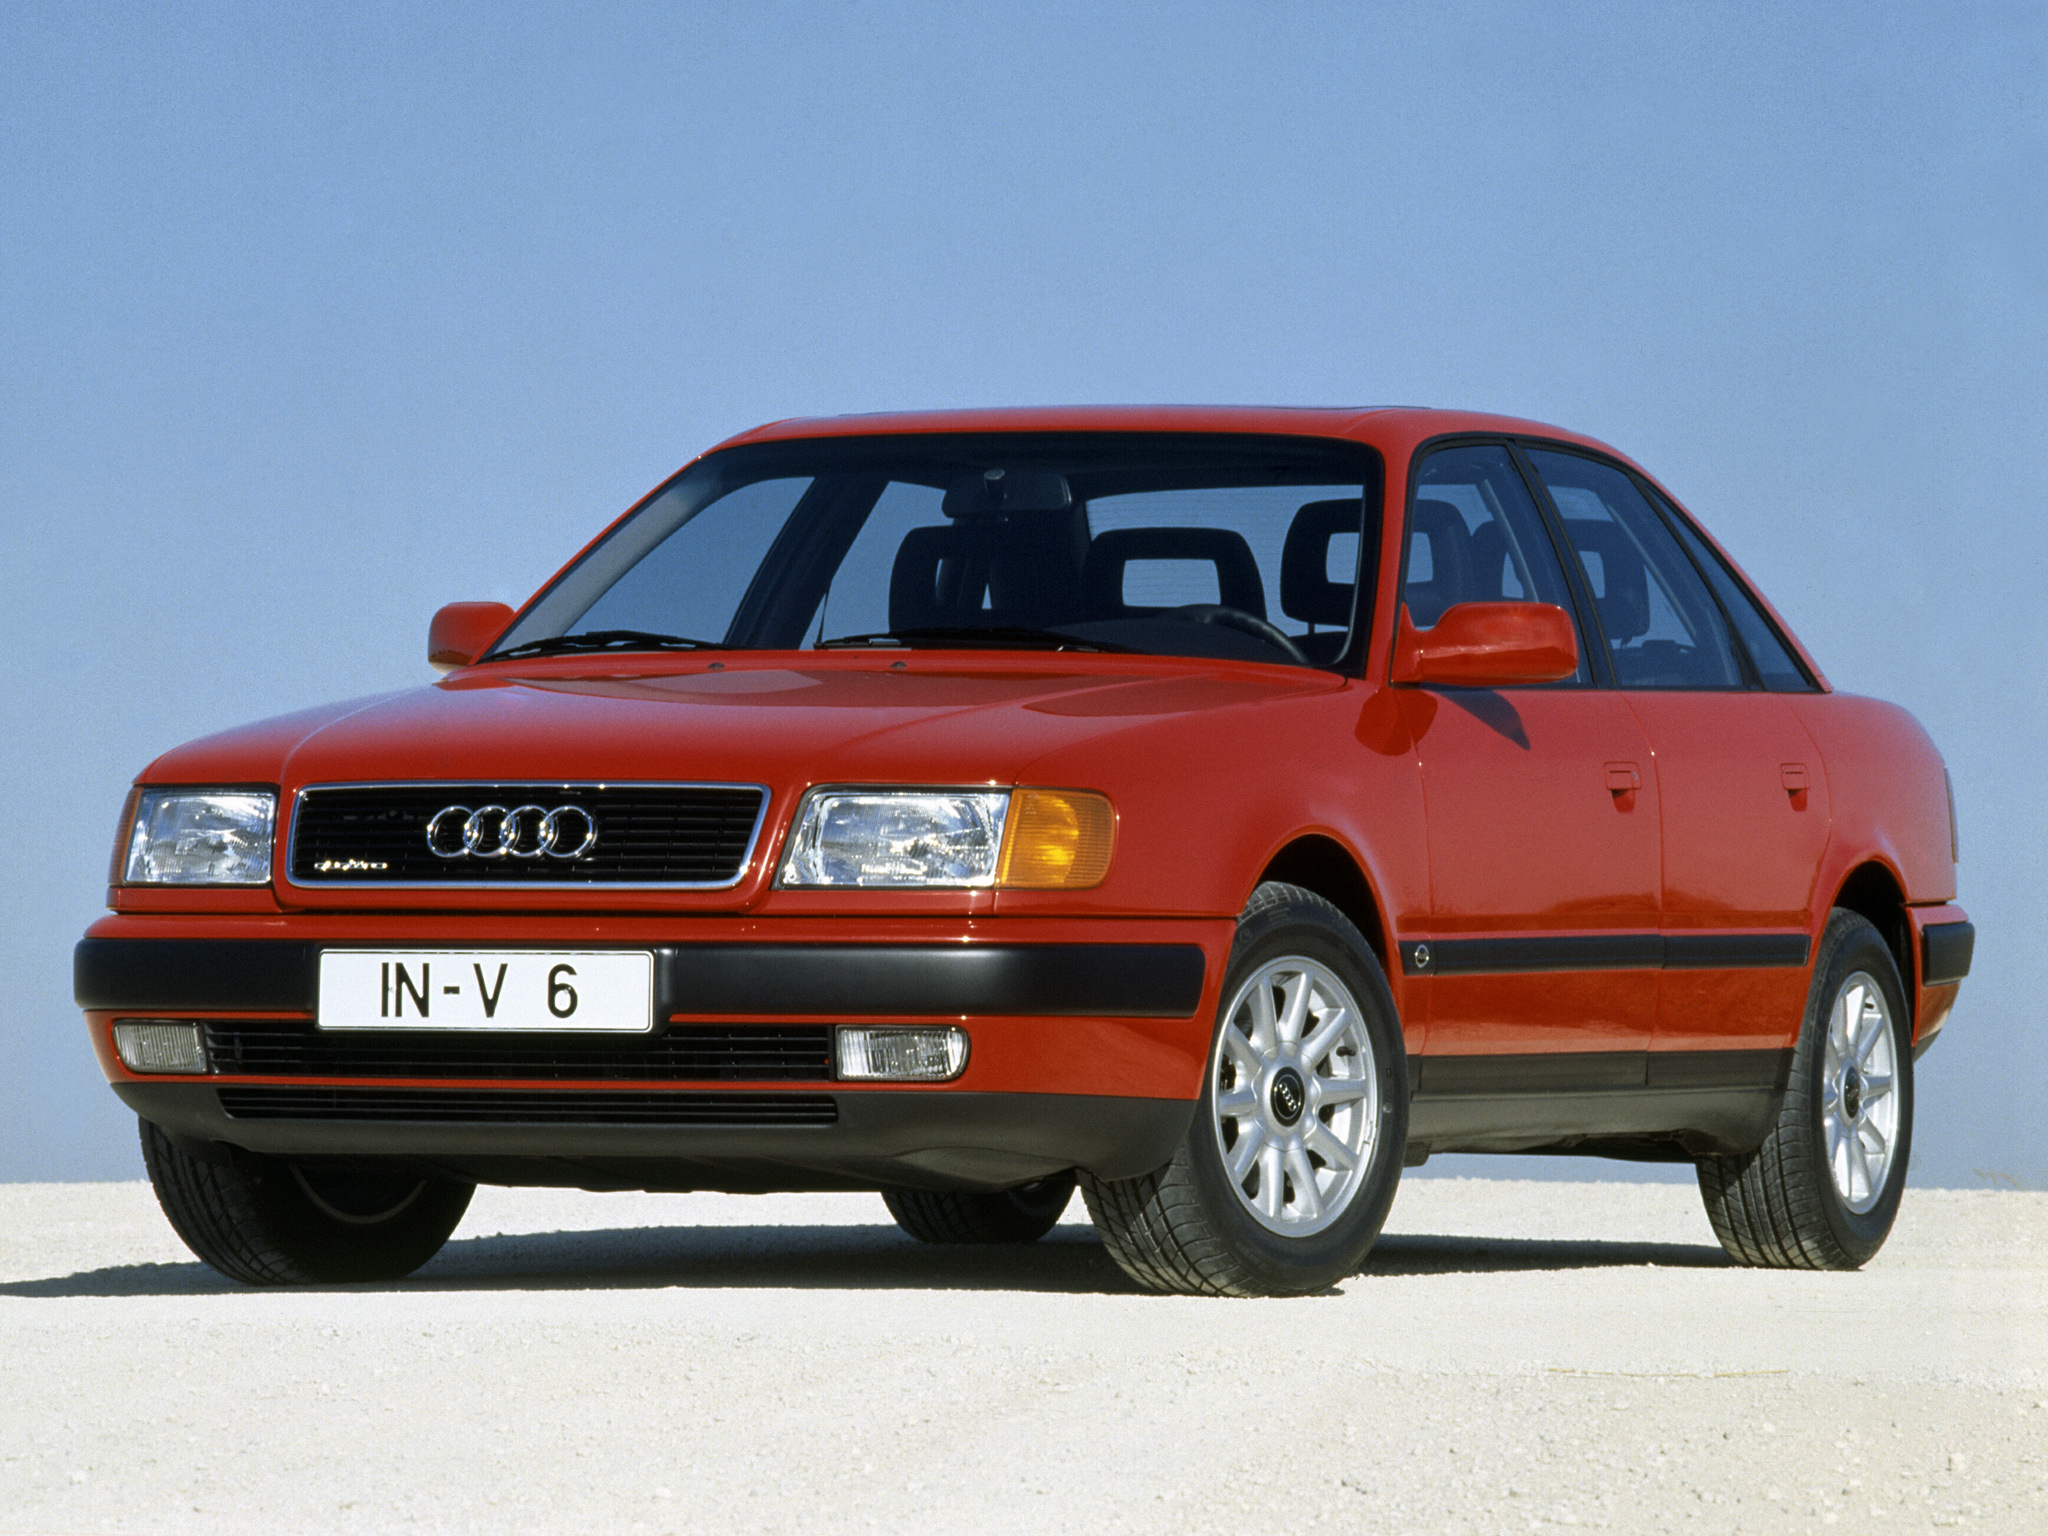 Audi 100 C4 Cool Cars Wallpaper 2048x1536